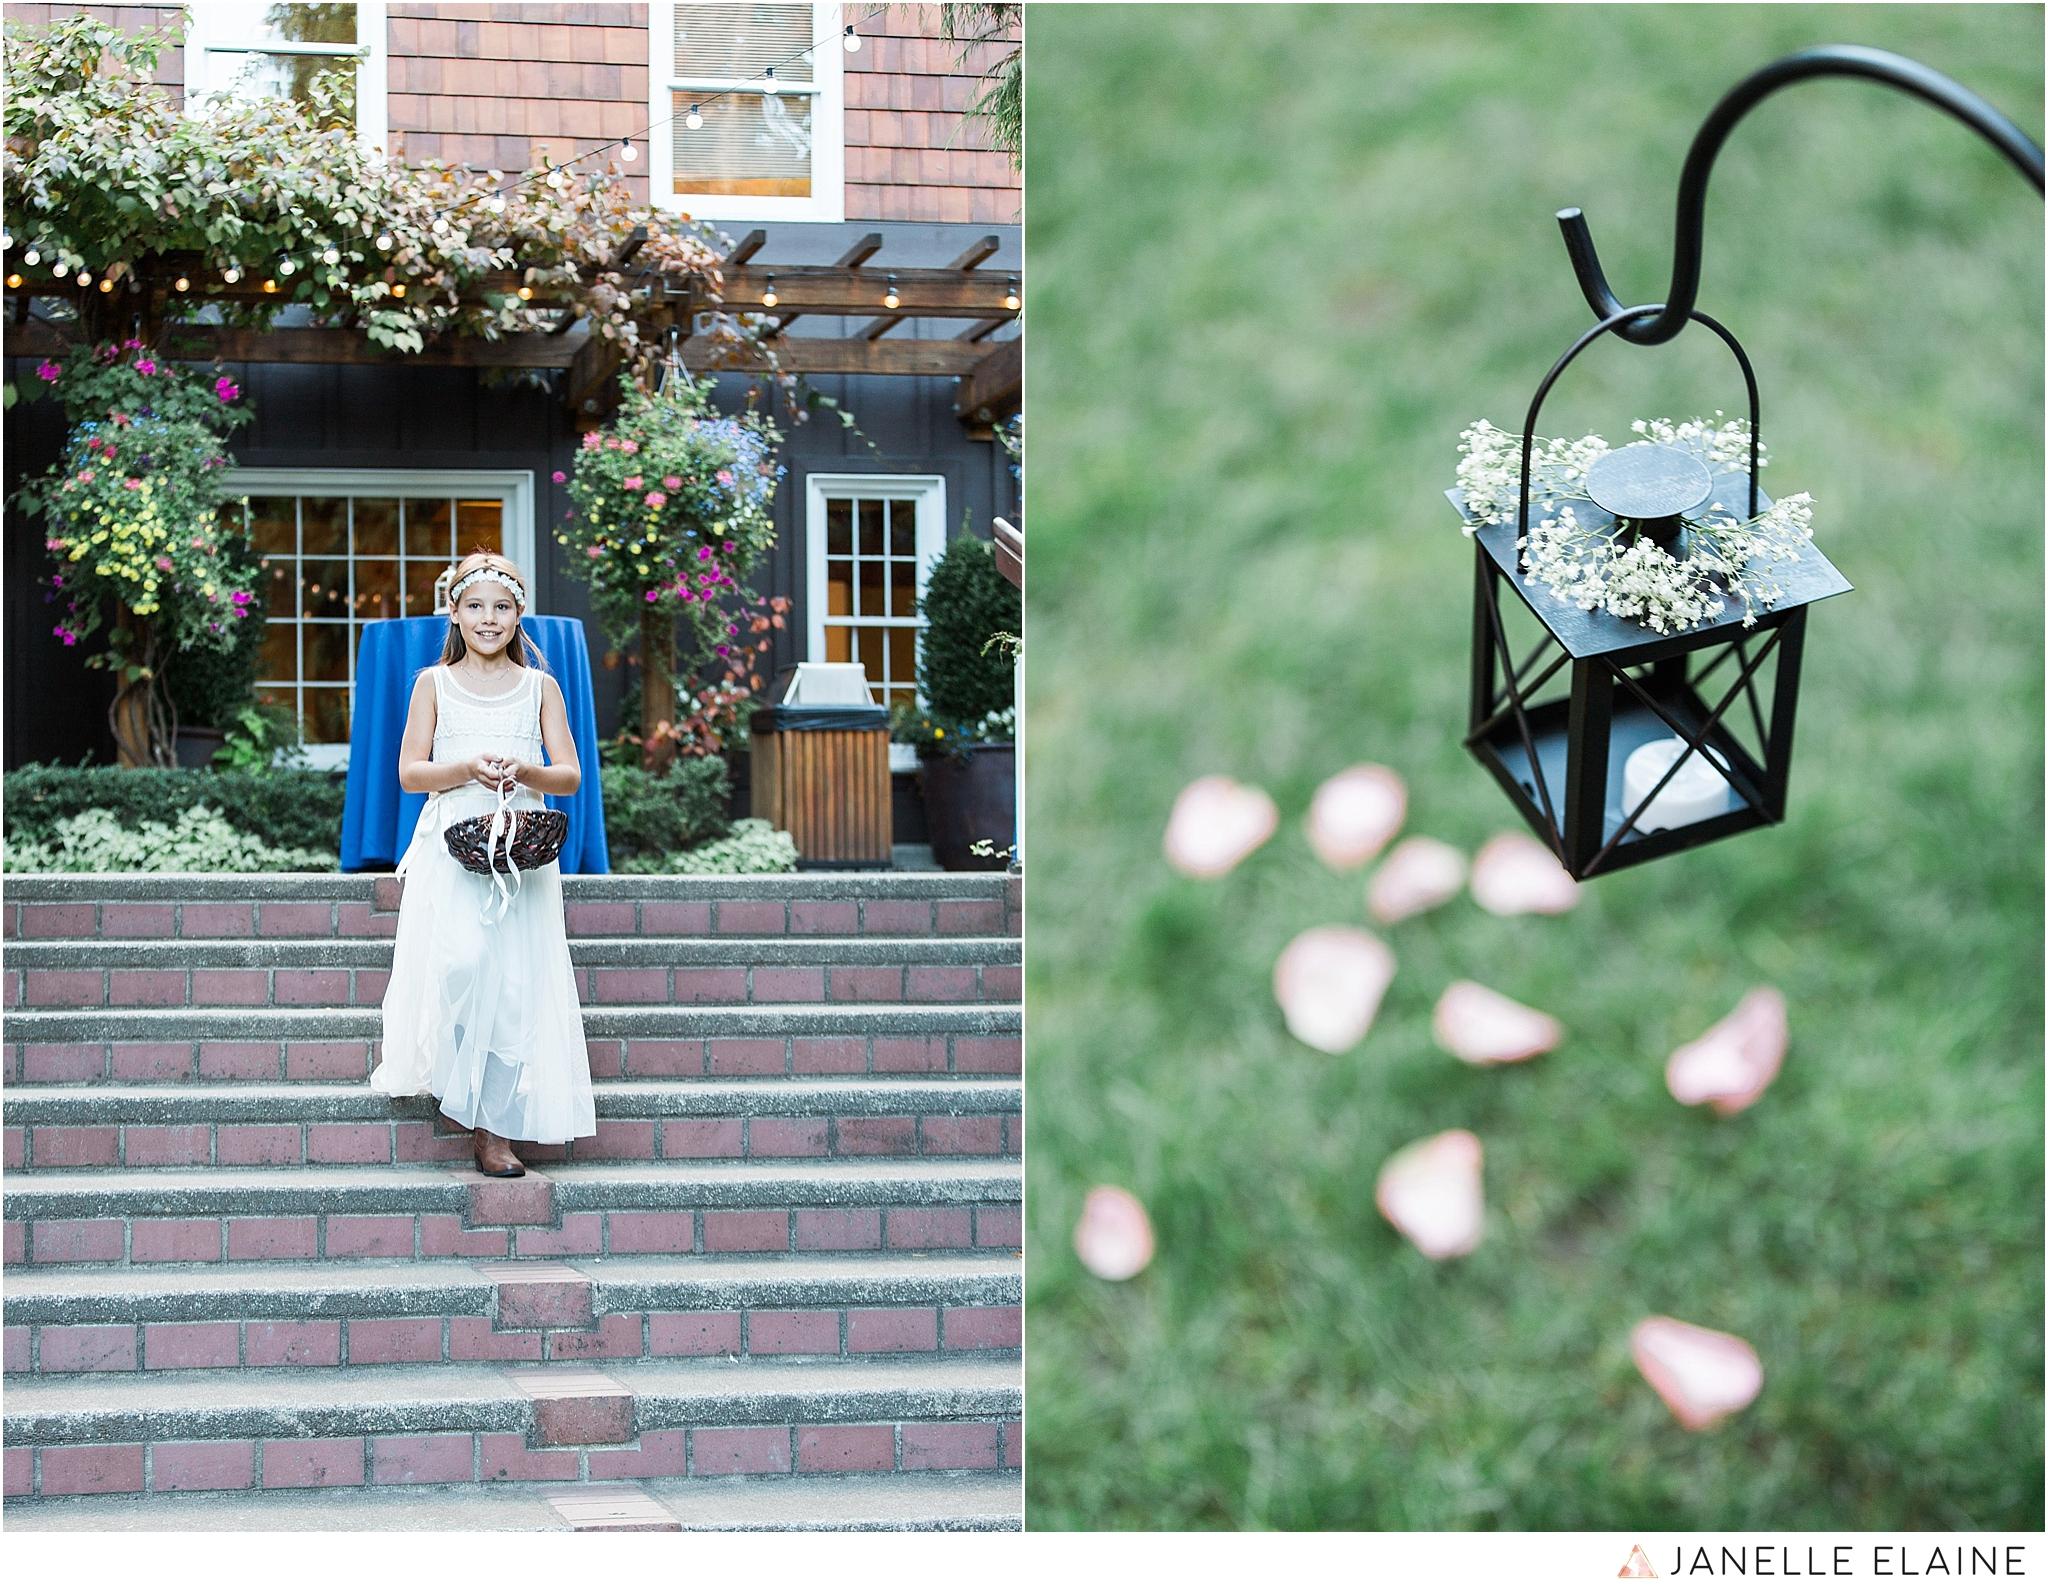 janelle elaine photography-professional wedding photographer-seattle-bellevue-robinswood house-131.jpg